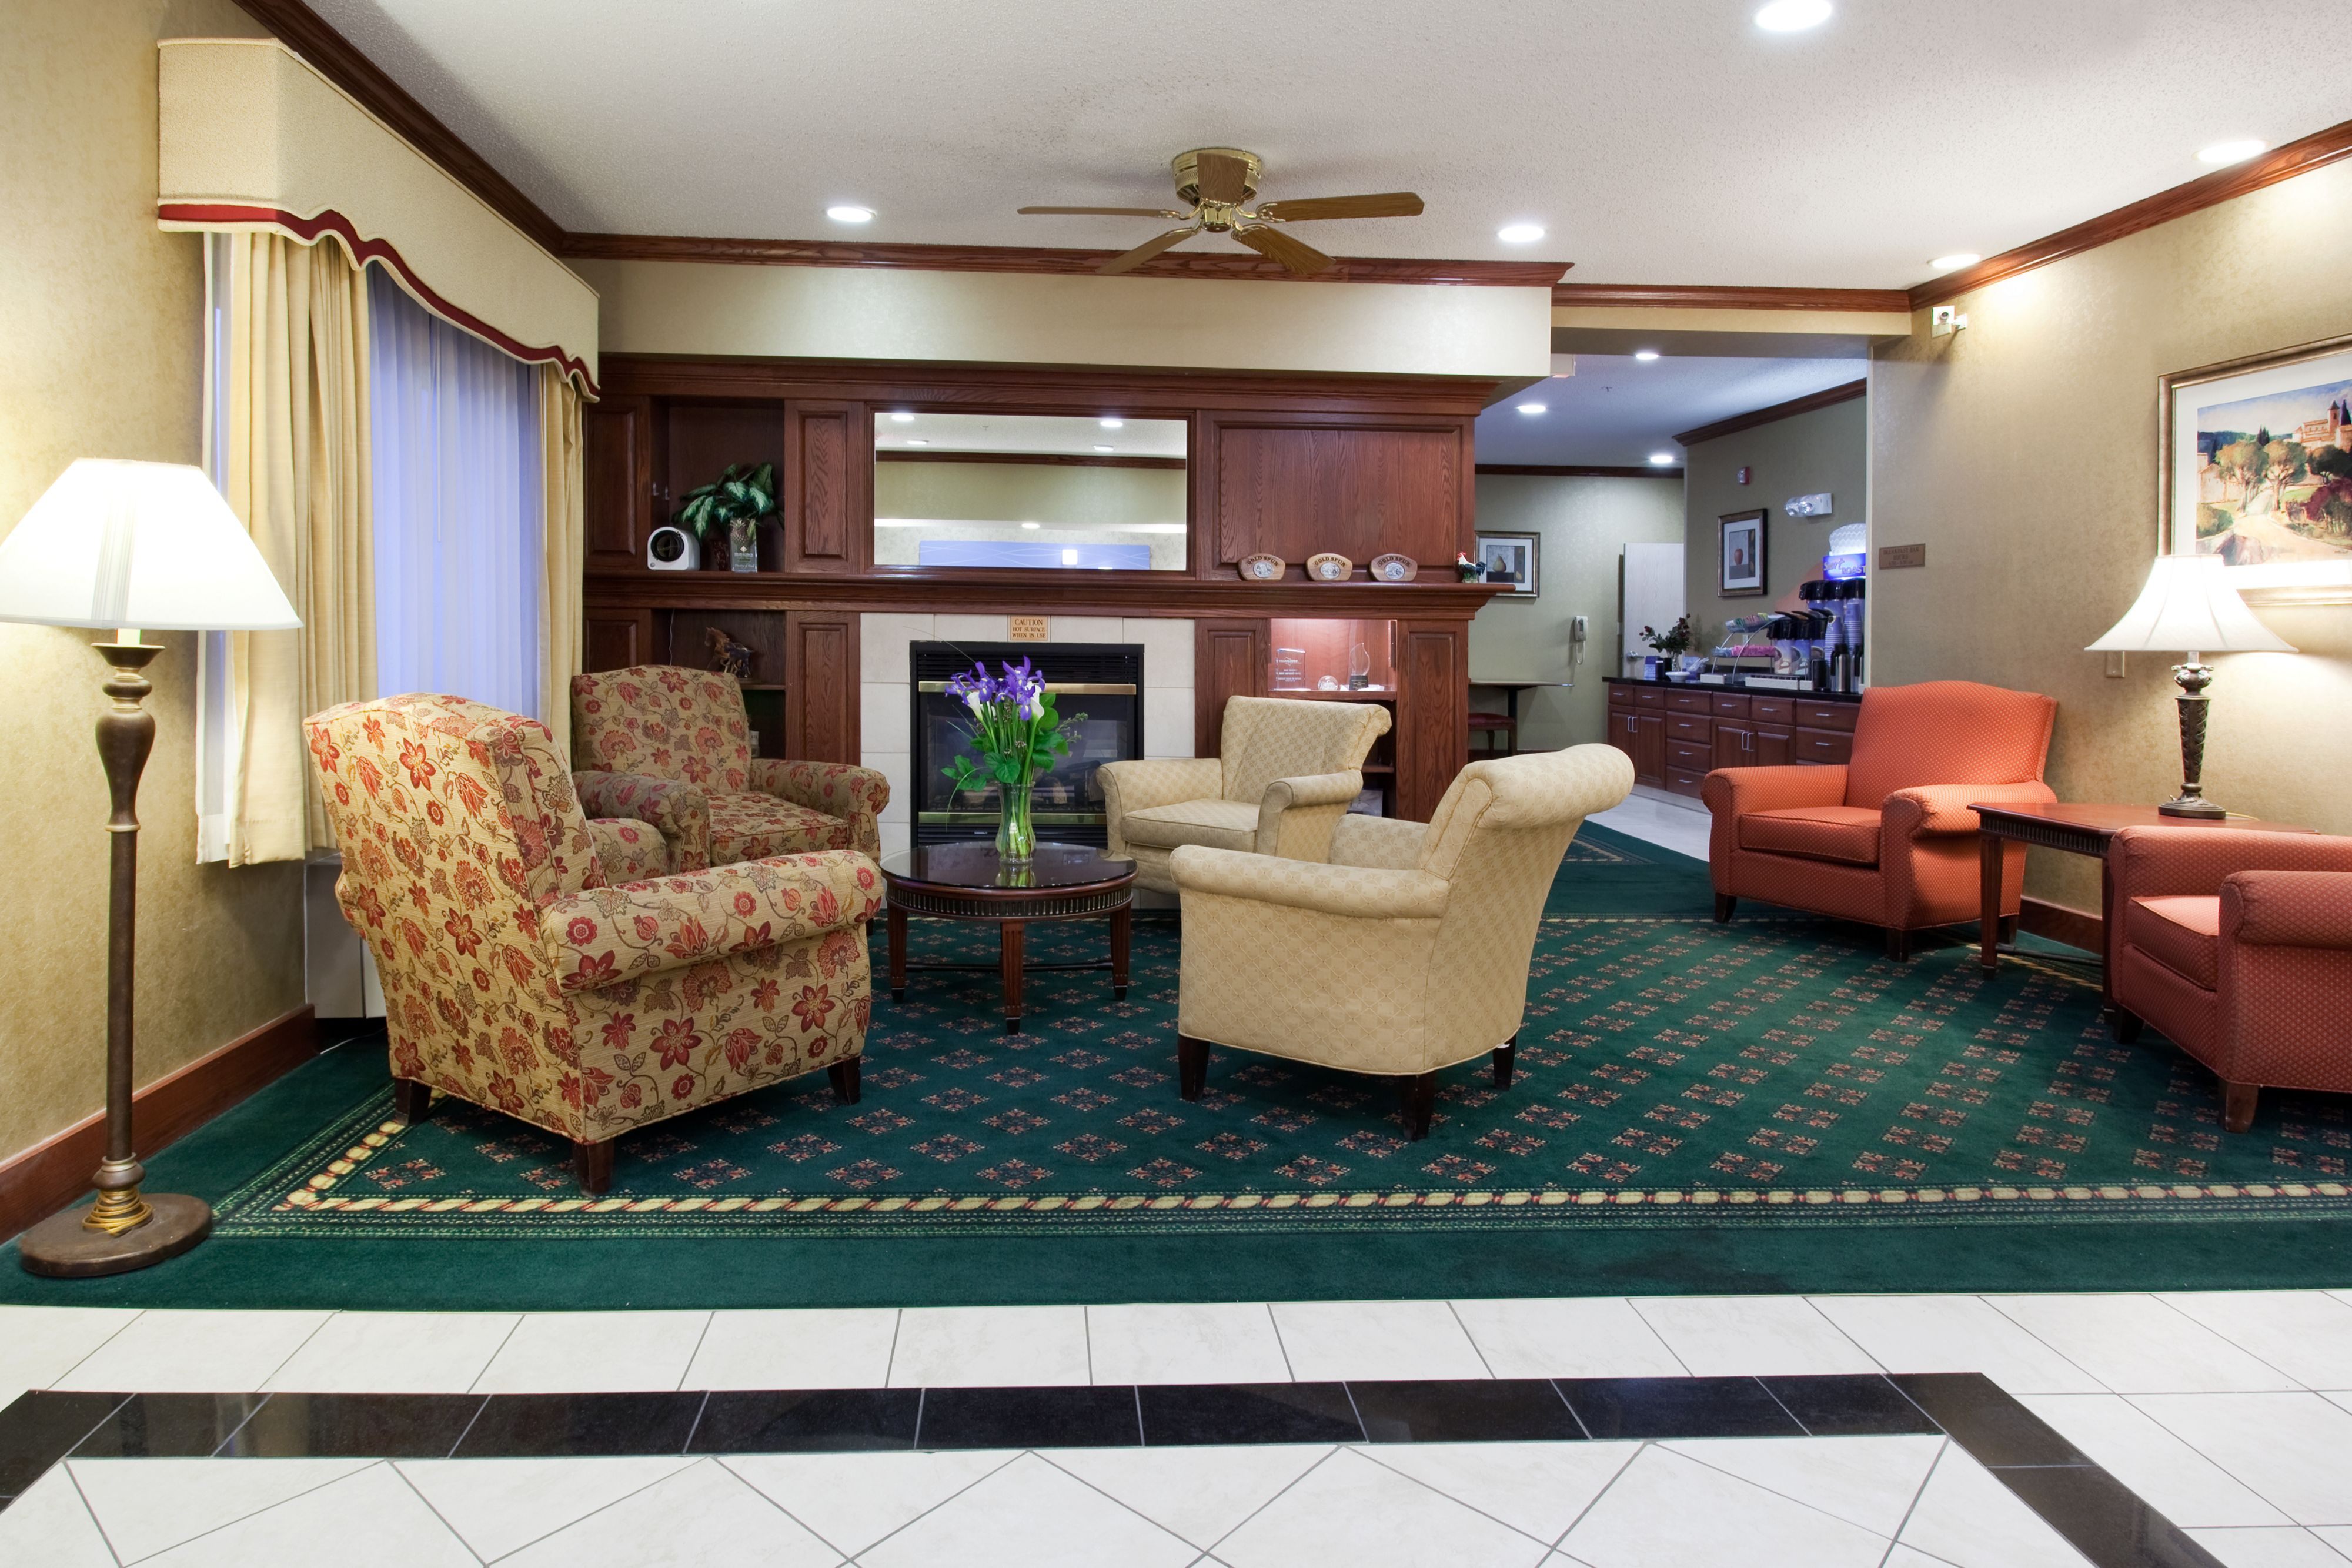 Holiday Inn Express Greeley image 6